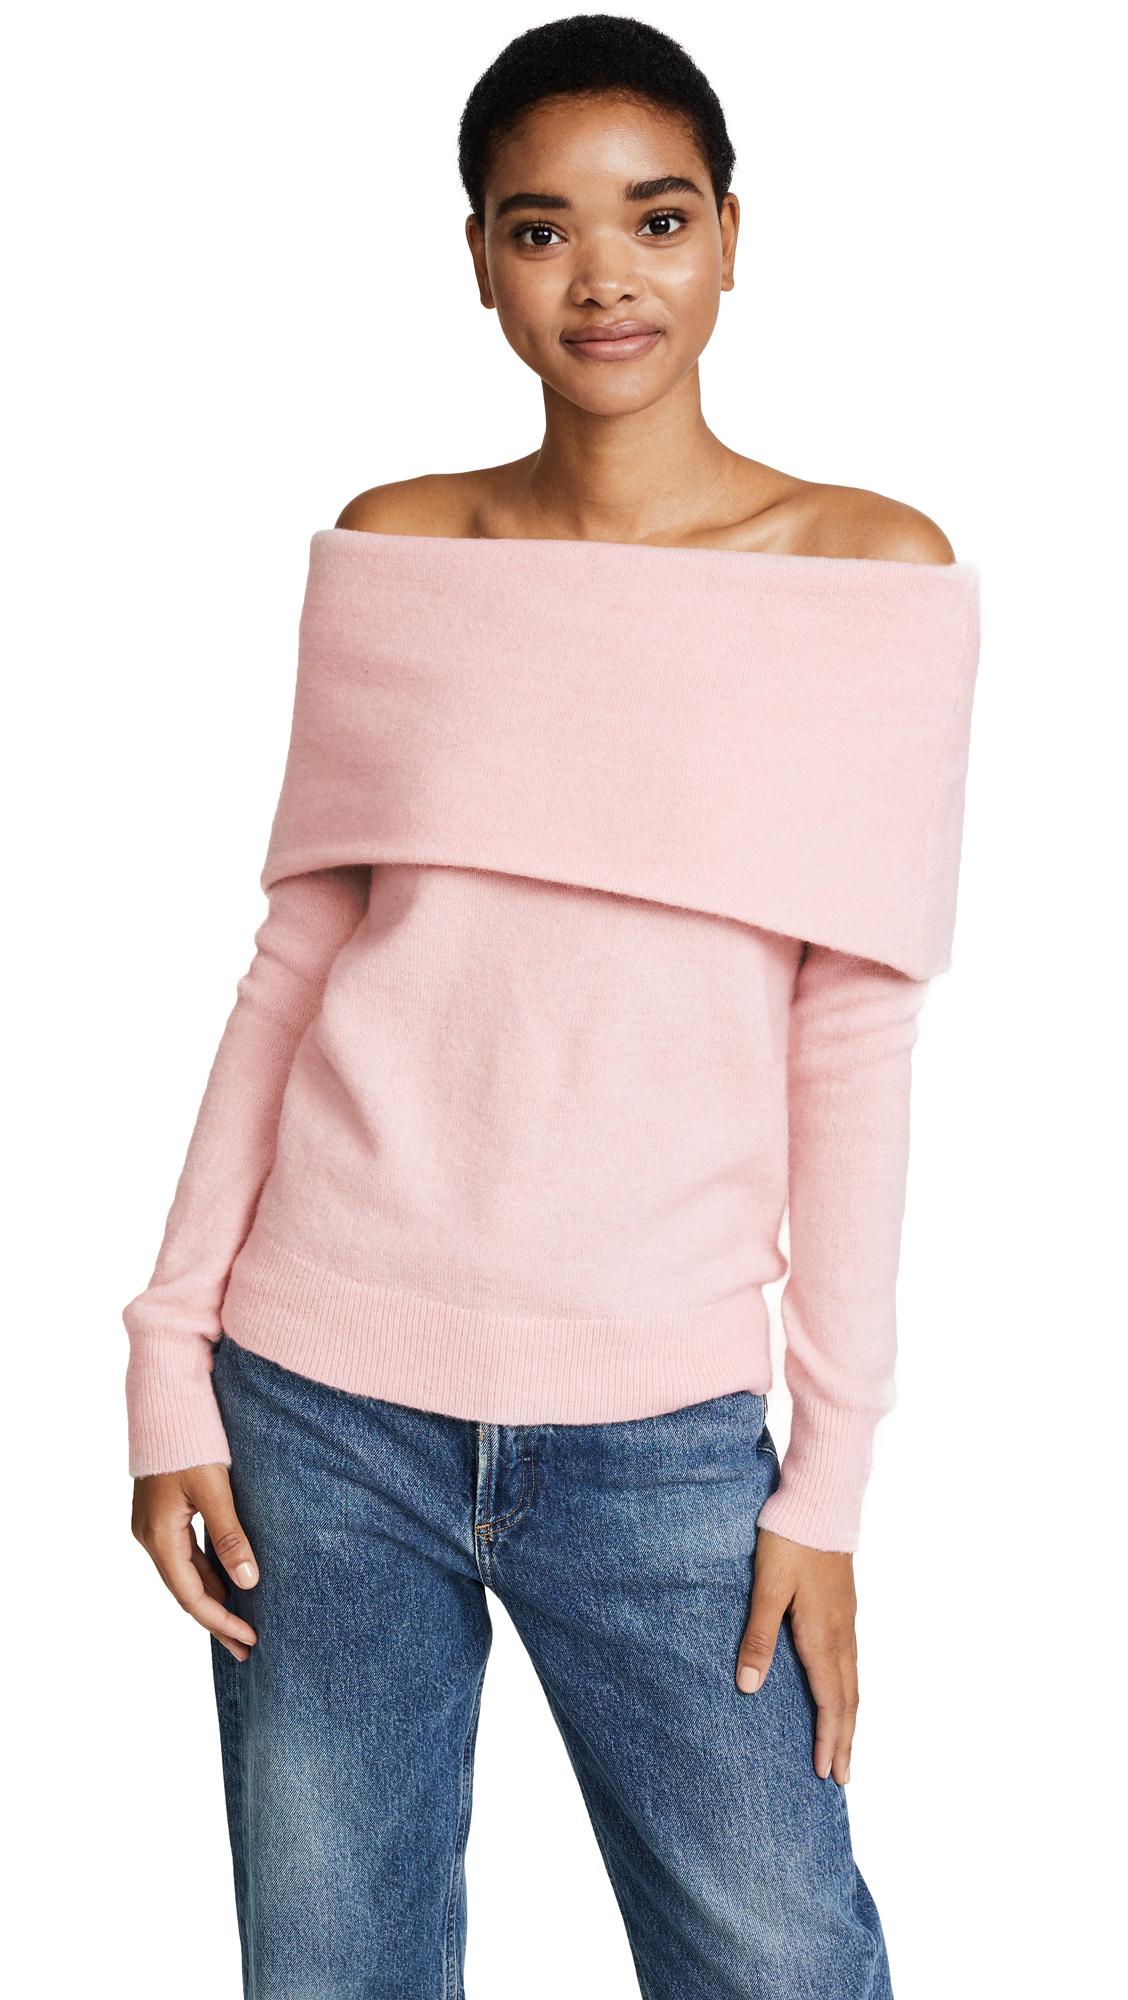 Club Monaco Charlotta Sweater - Blush